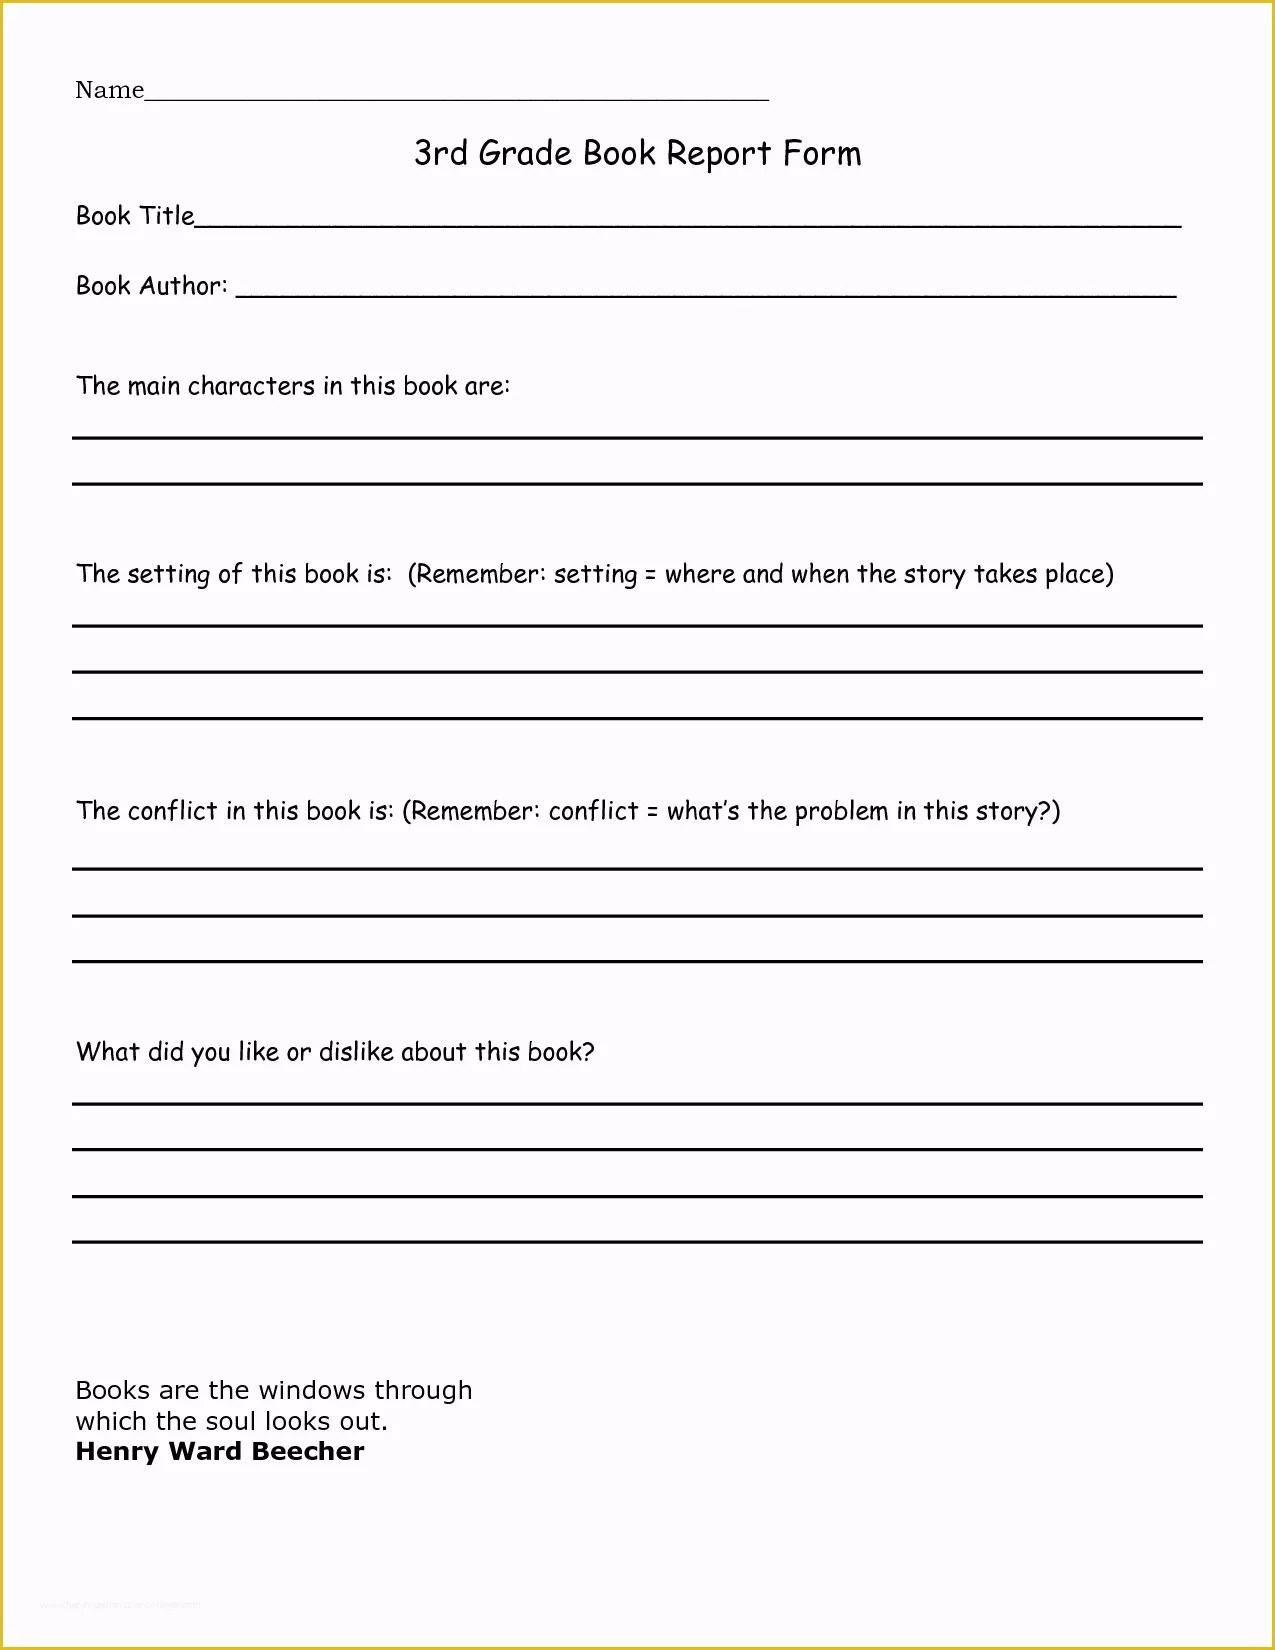 2nd Grade Book Report Template Free Of 3rd Grade Book